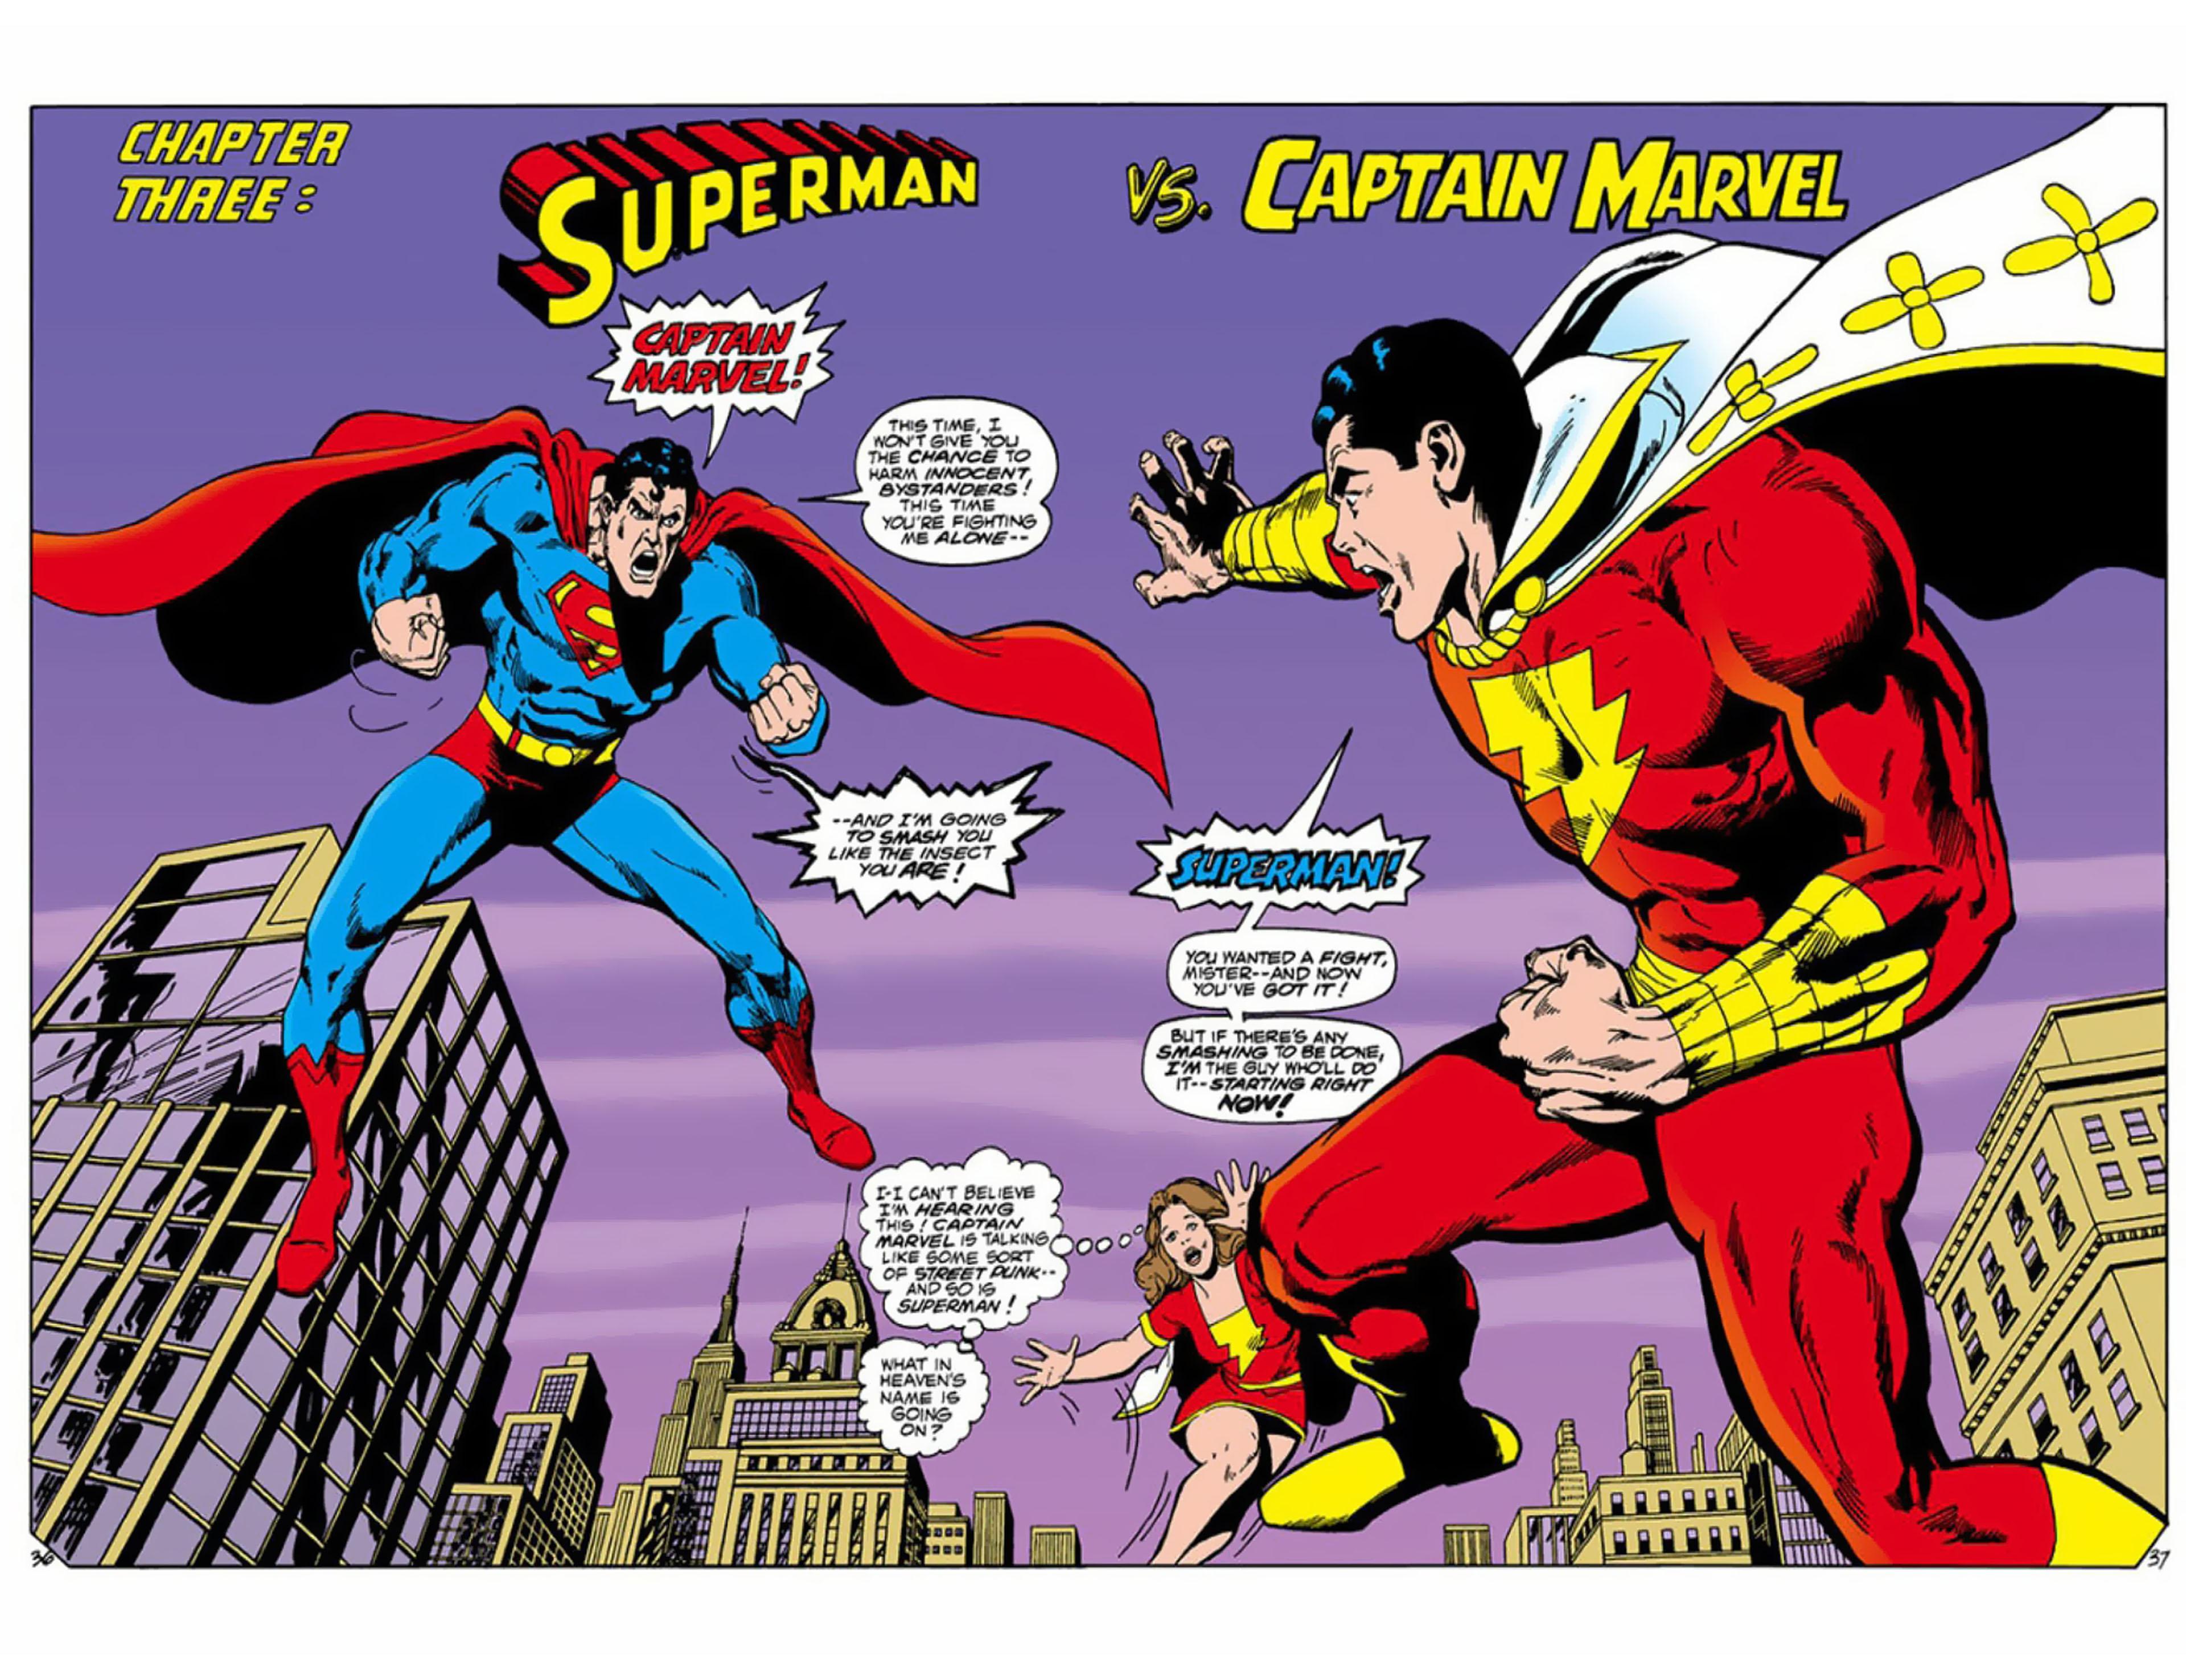 Superman vs Shazam! review